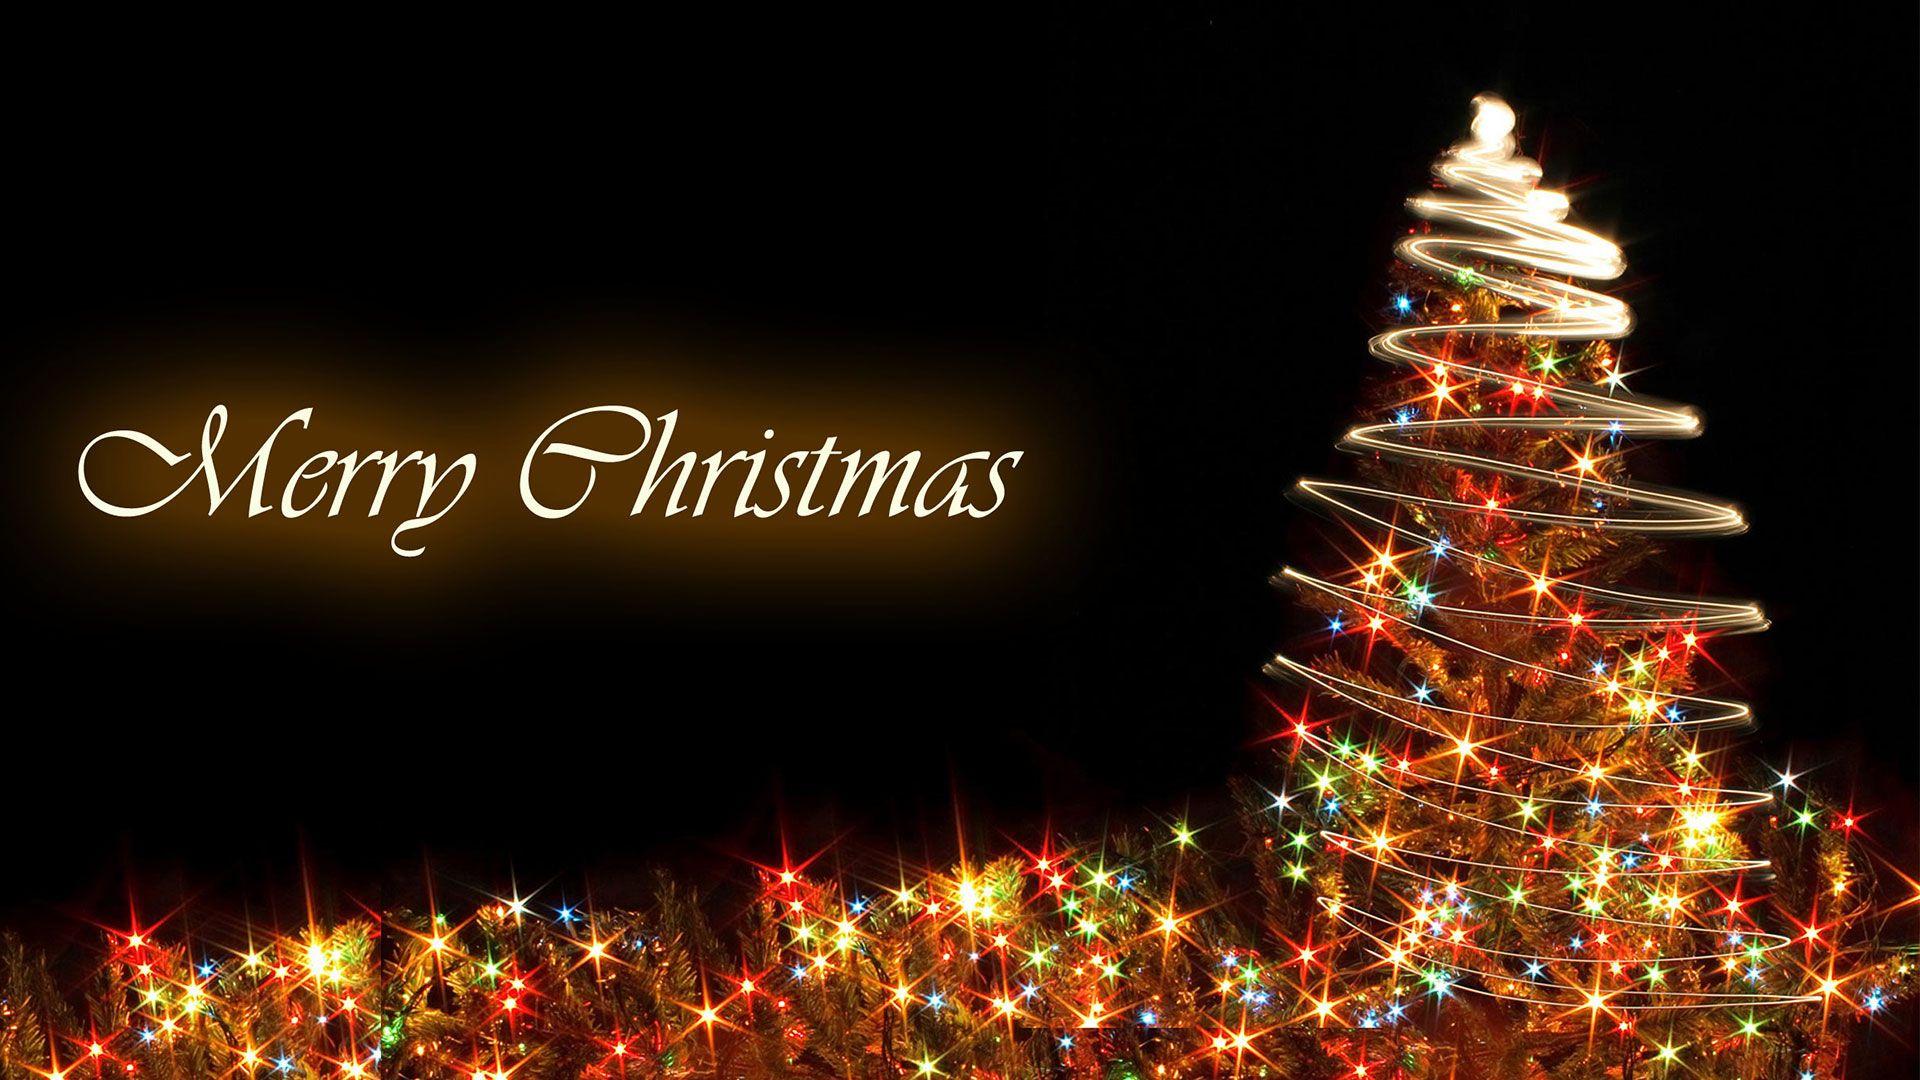 Best-Christmas-Decor-Ideas-Image.jpg 1,920×1,080 pixels | Christmas ...